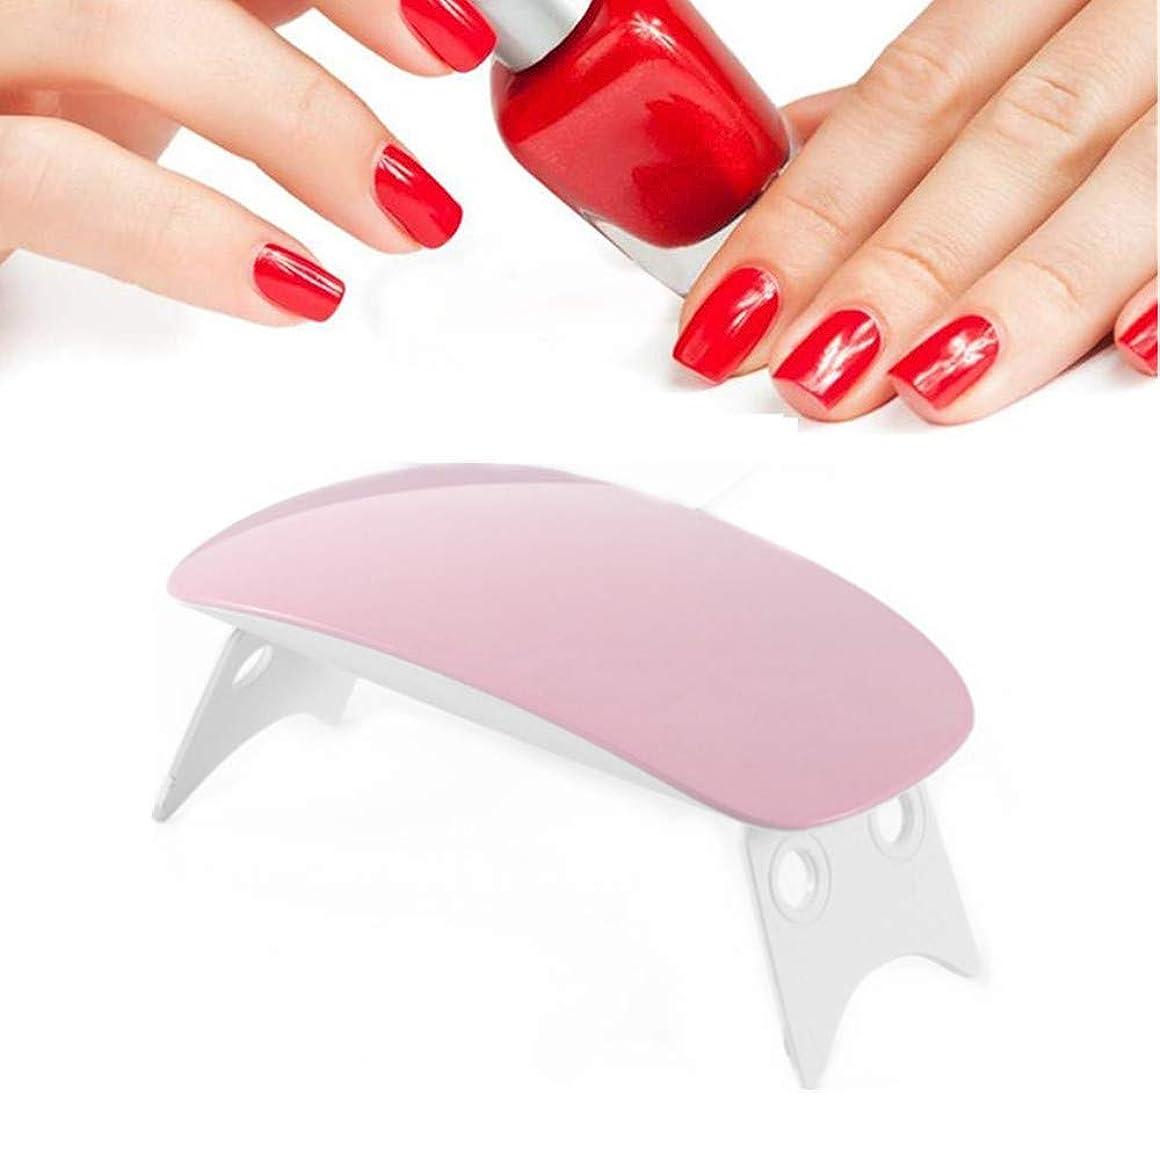 UV LED 硬化用 ライト ネイルドライヤー 折りたたみ式 usbライト ジェルネイル用 携帯用 (ピンク)